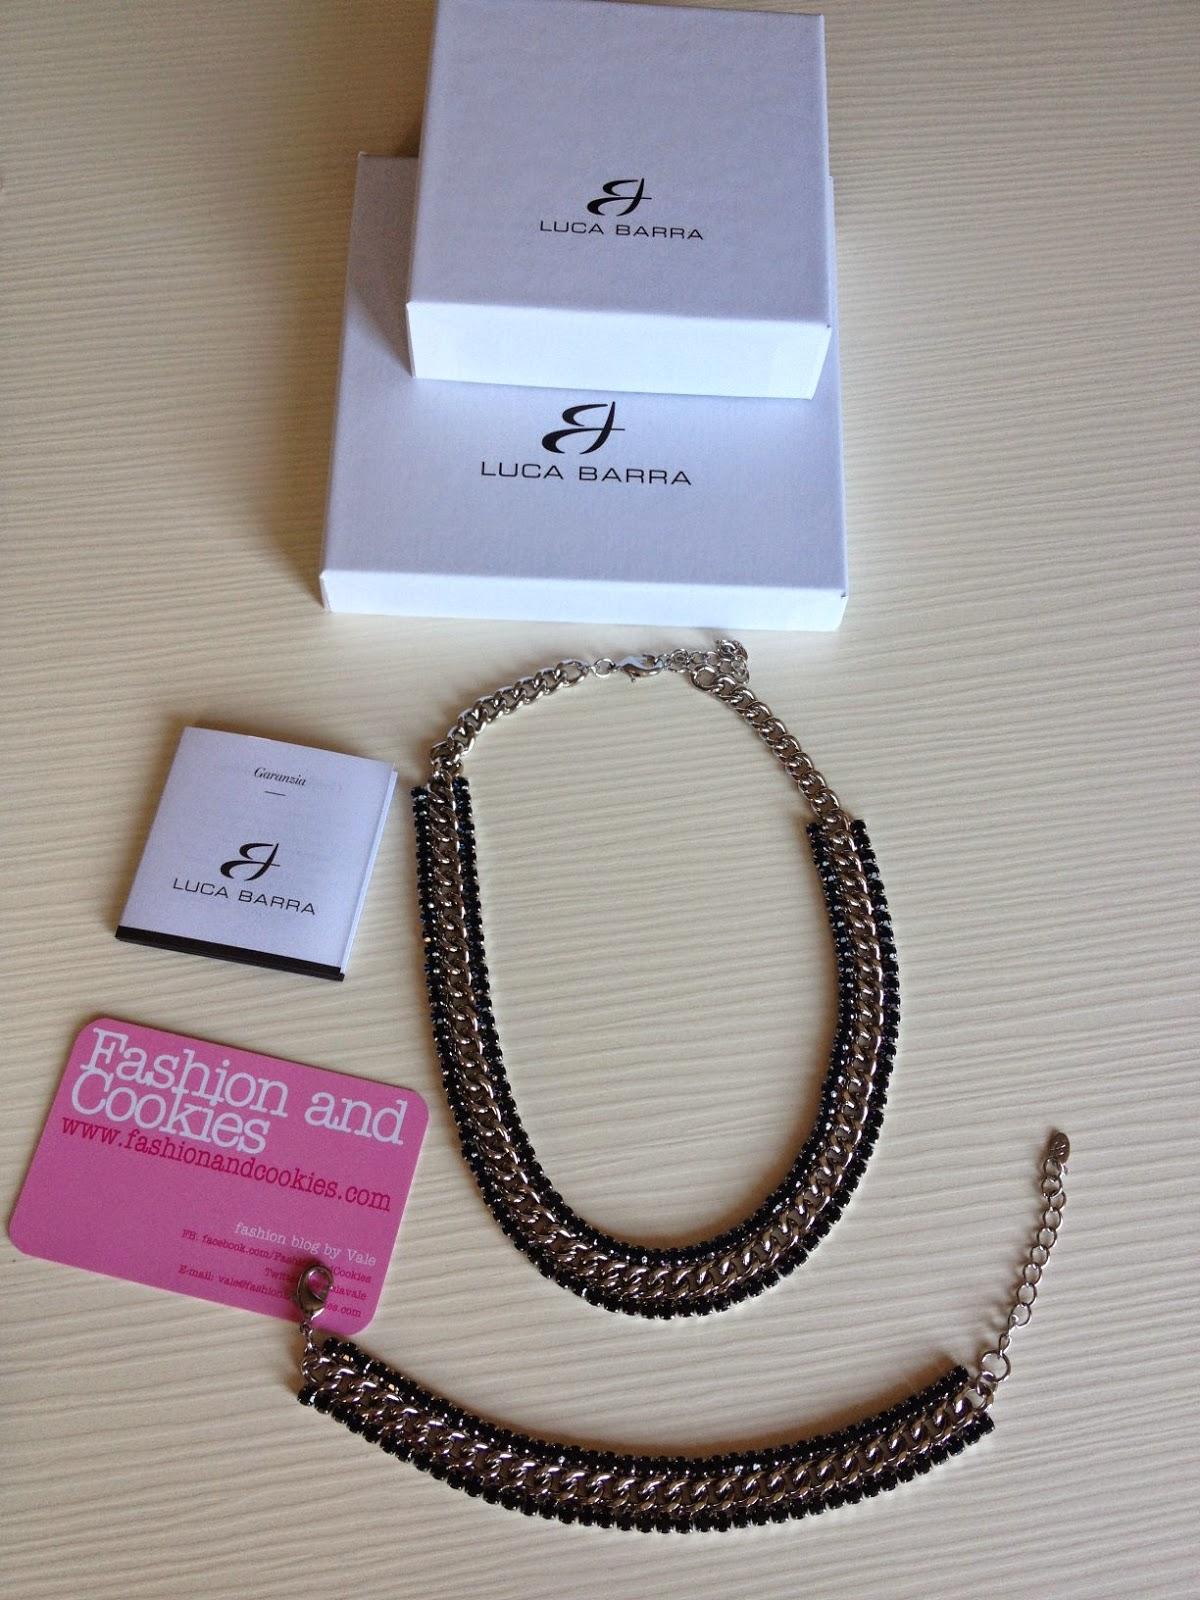 Luca Barra gioielli, Luca Barra jewels, Fashion and Cookies, fashion blogger